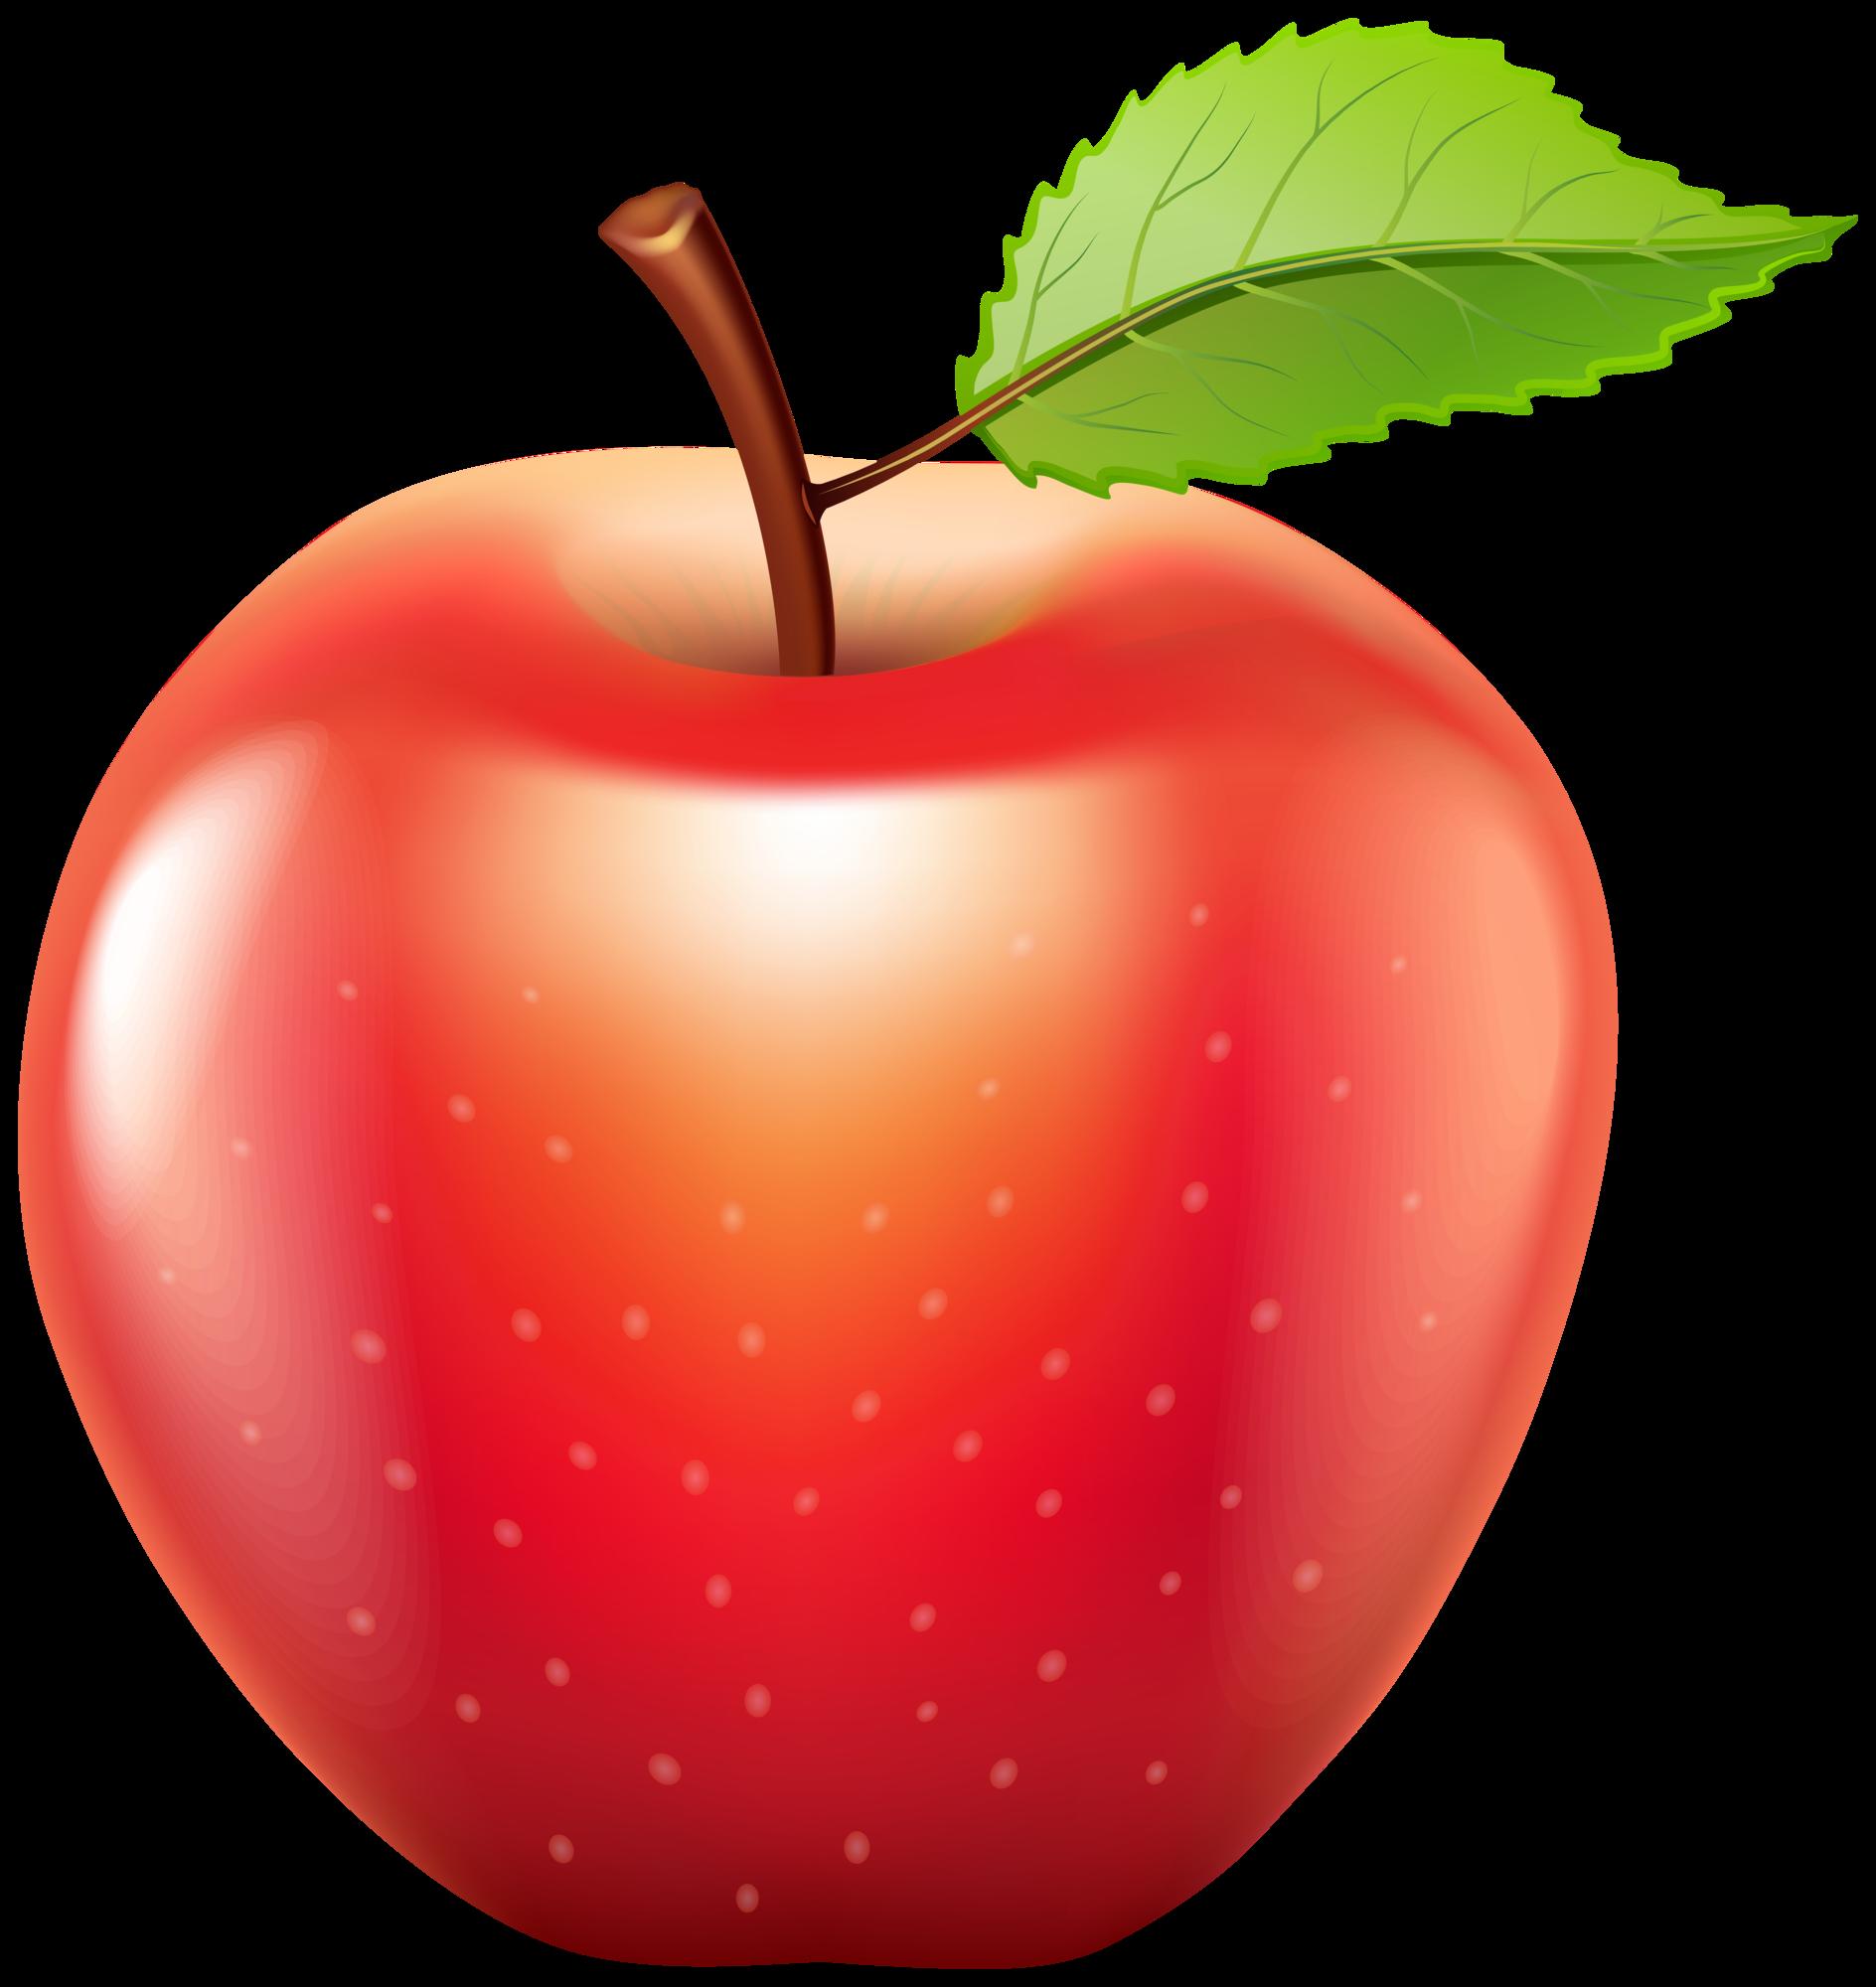 Png Apple Clipart Apple clip art, Fruit cartoon, Apple